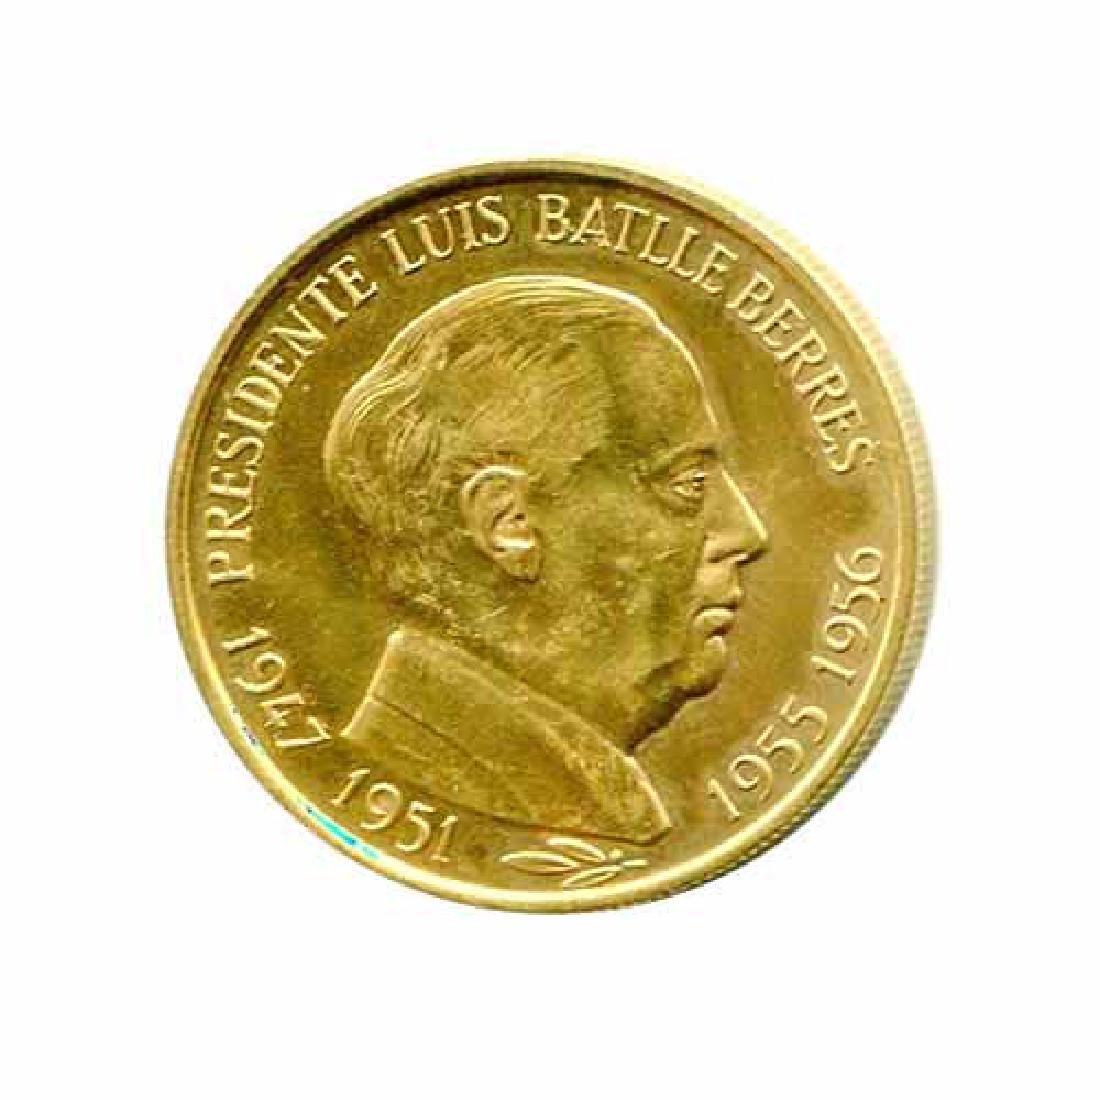 Uruguay Gold Medal President Luis Batlle Berres